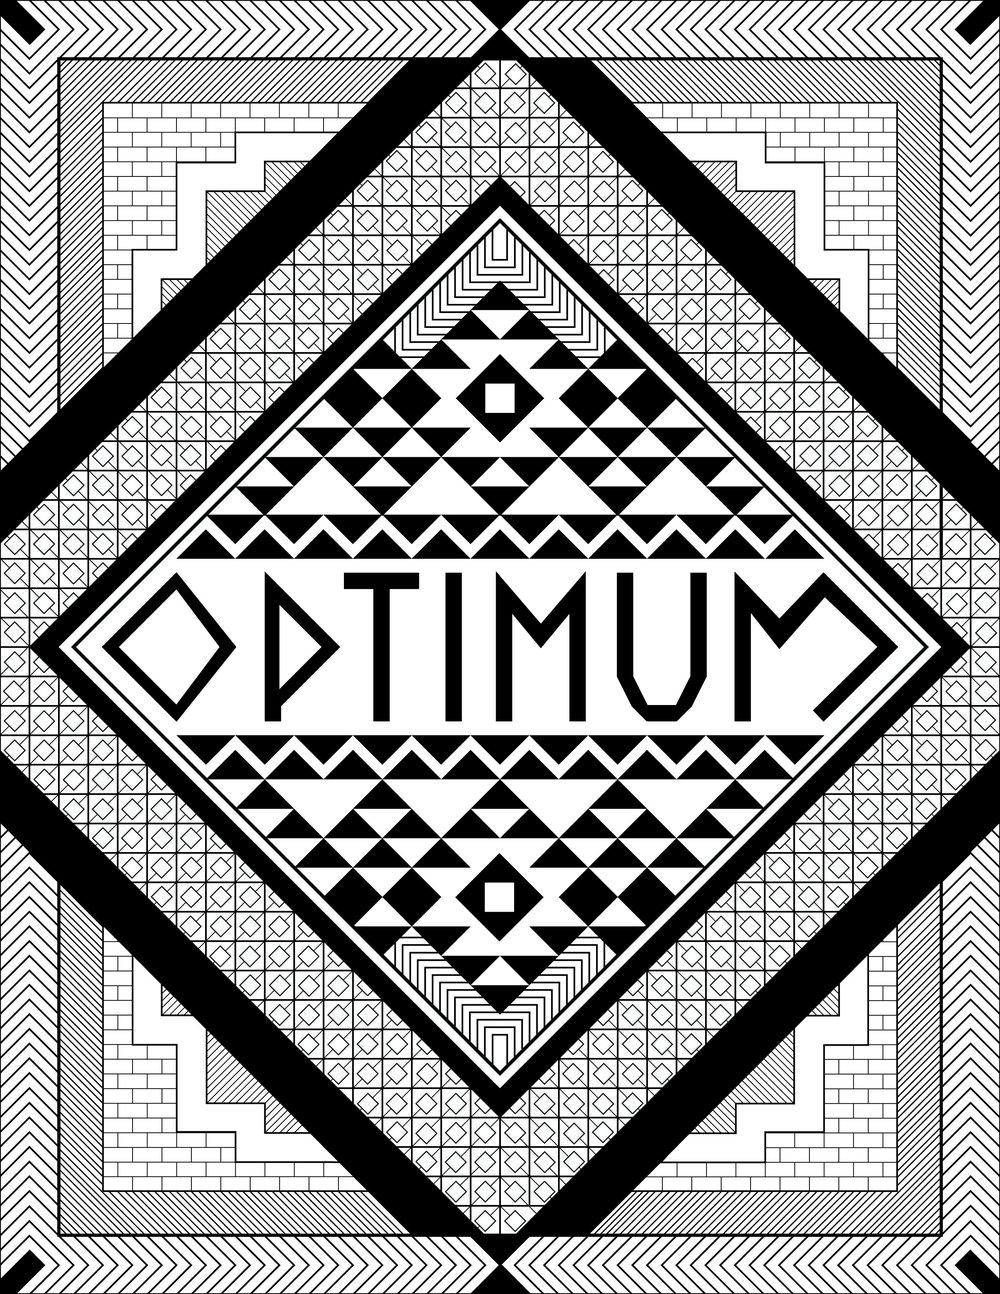 Optimum.jpg